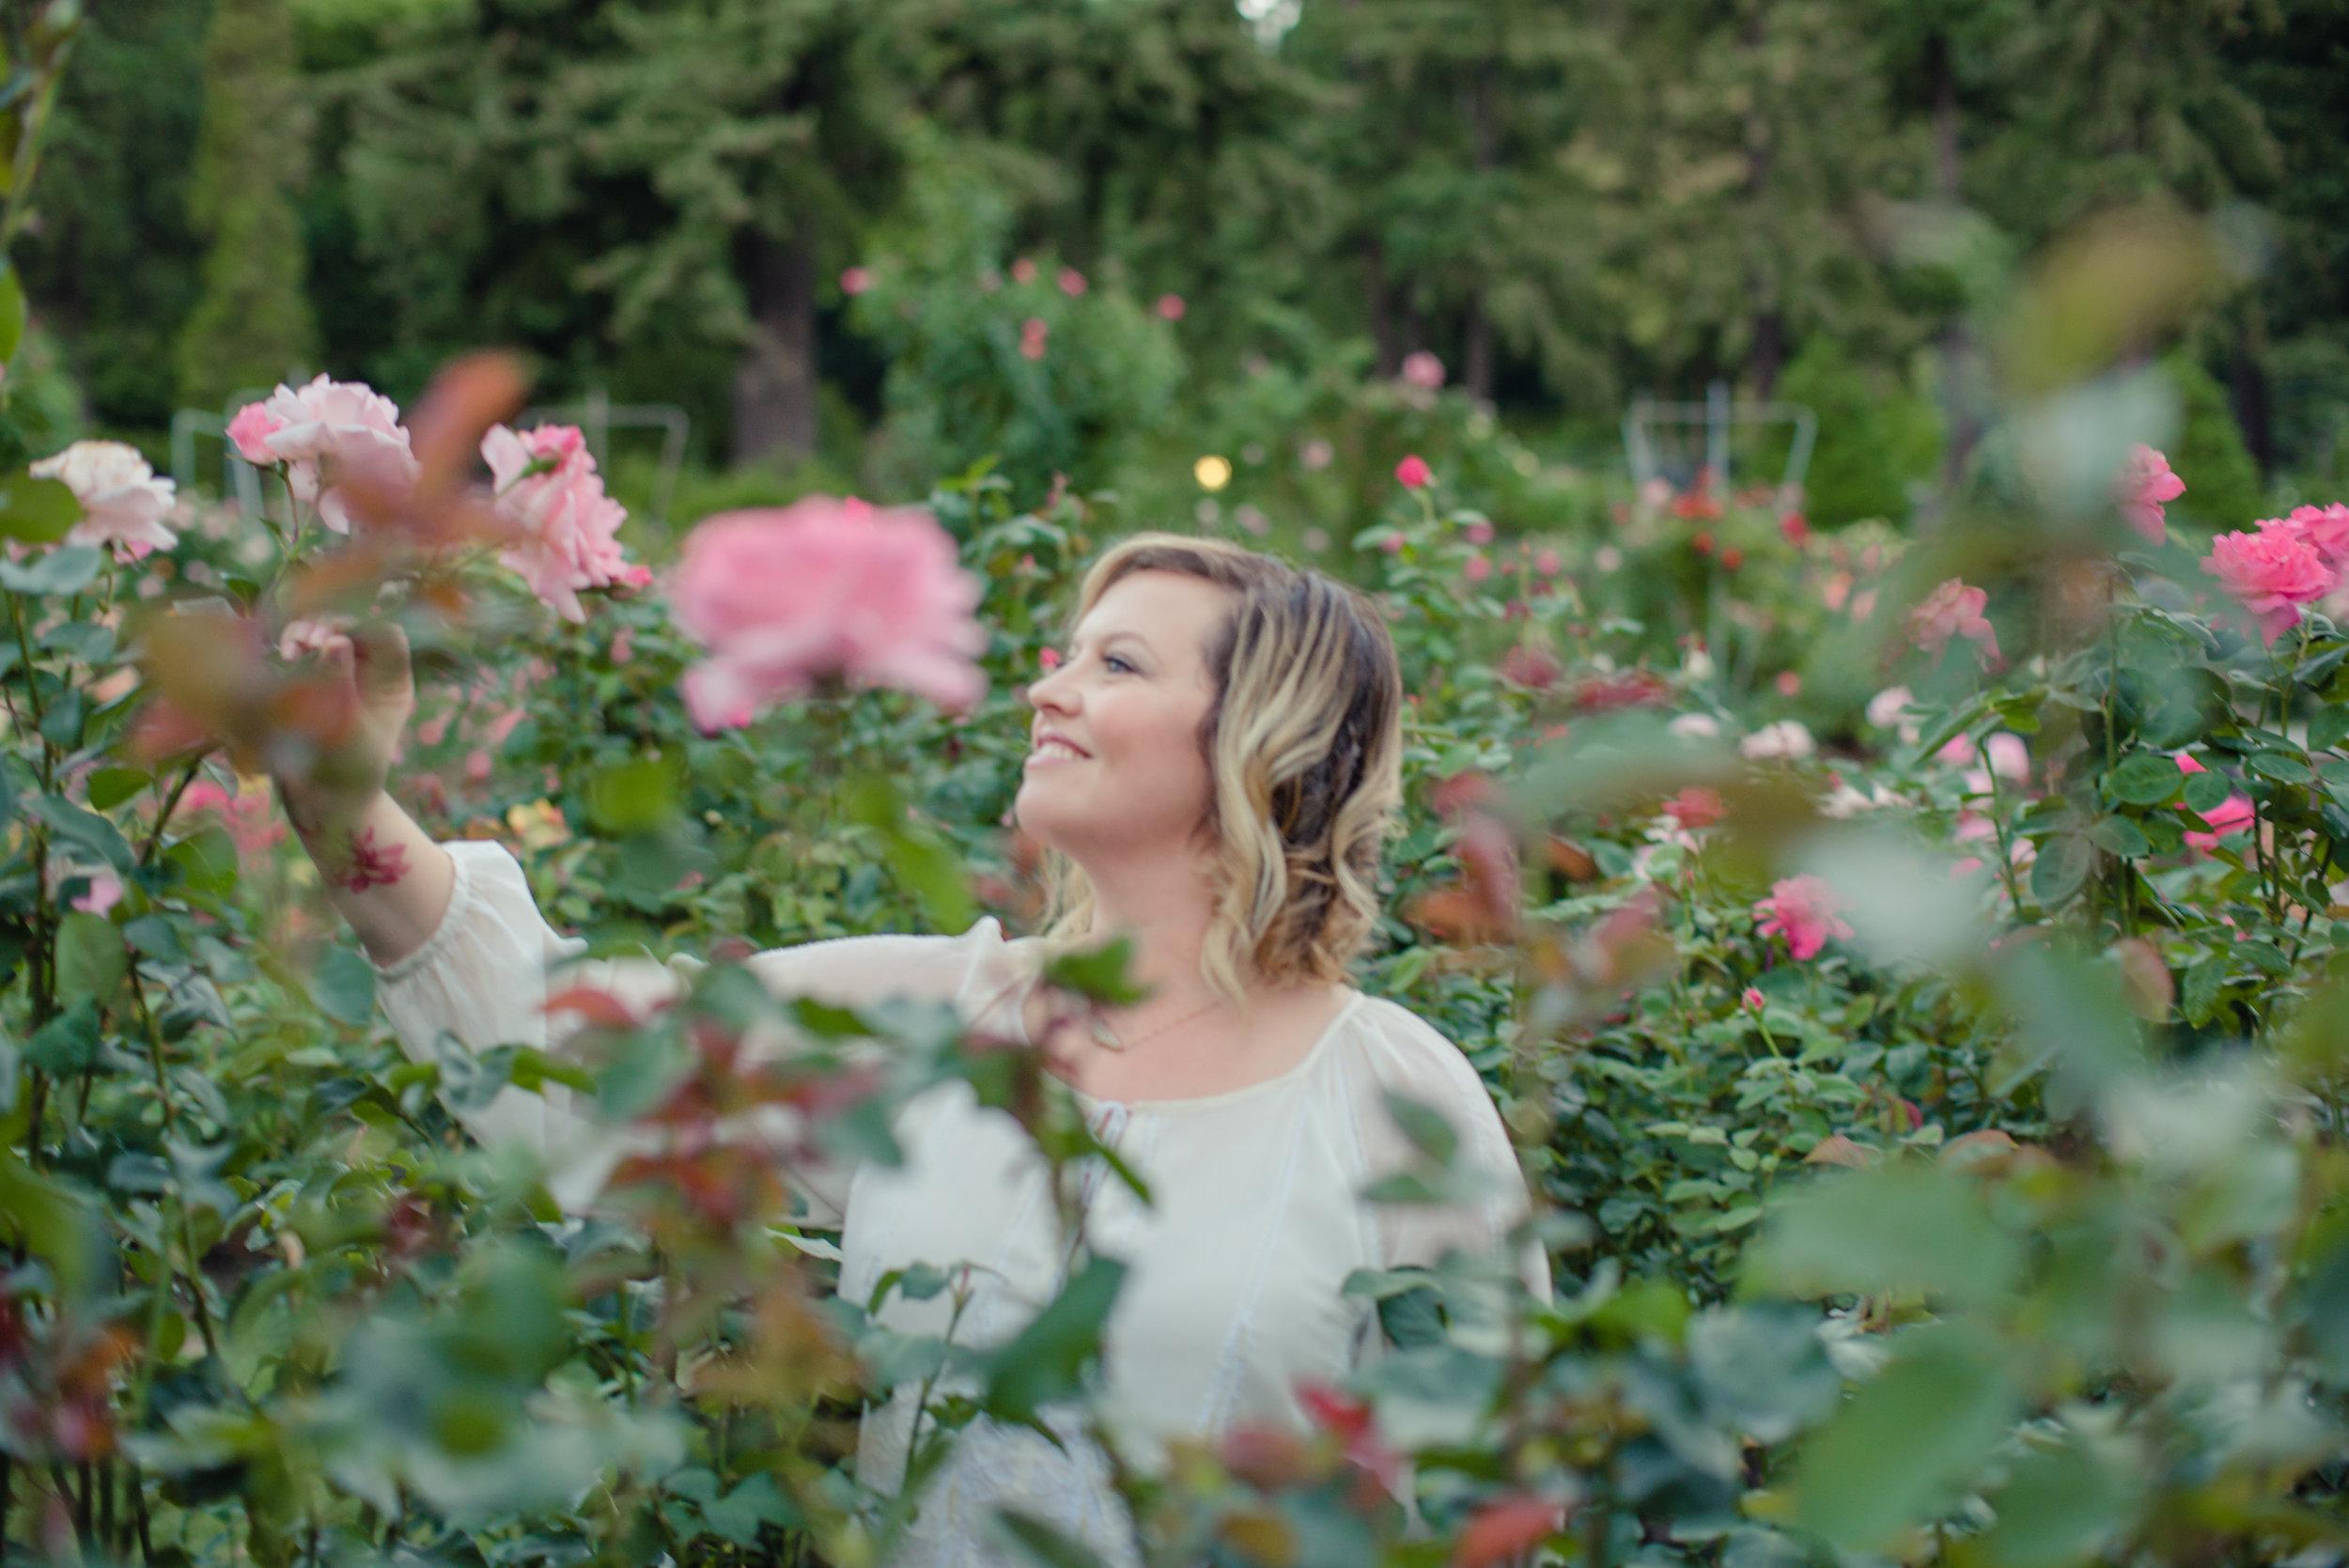 Kristy Maffit Branding Photos, Taken by Brightly & Co. (www.BrightlyandCo.com).